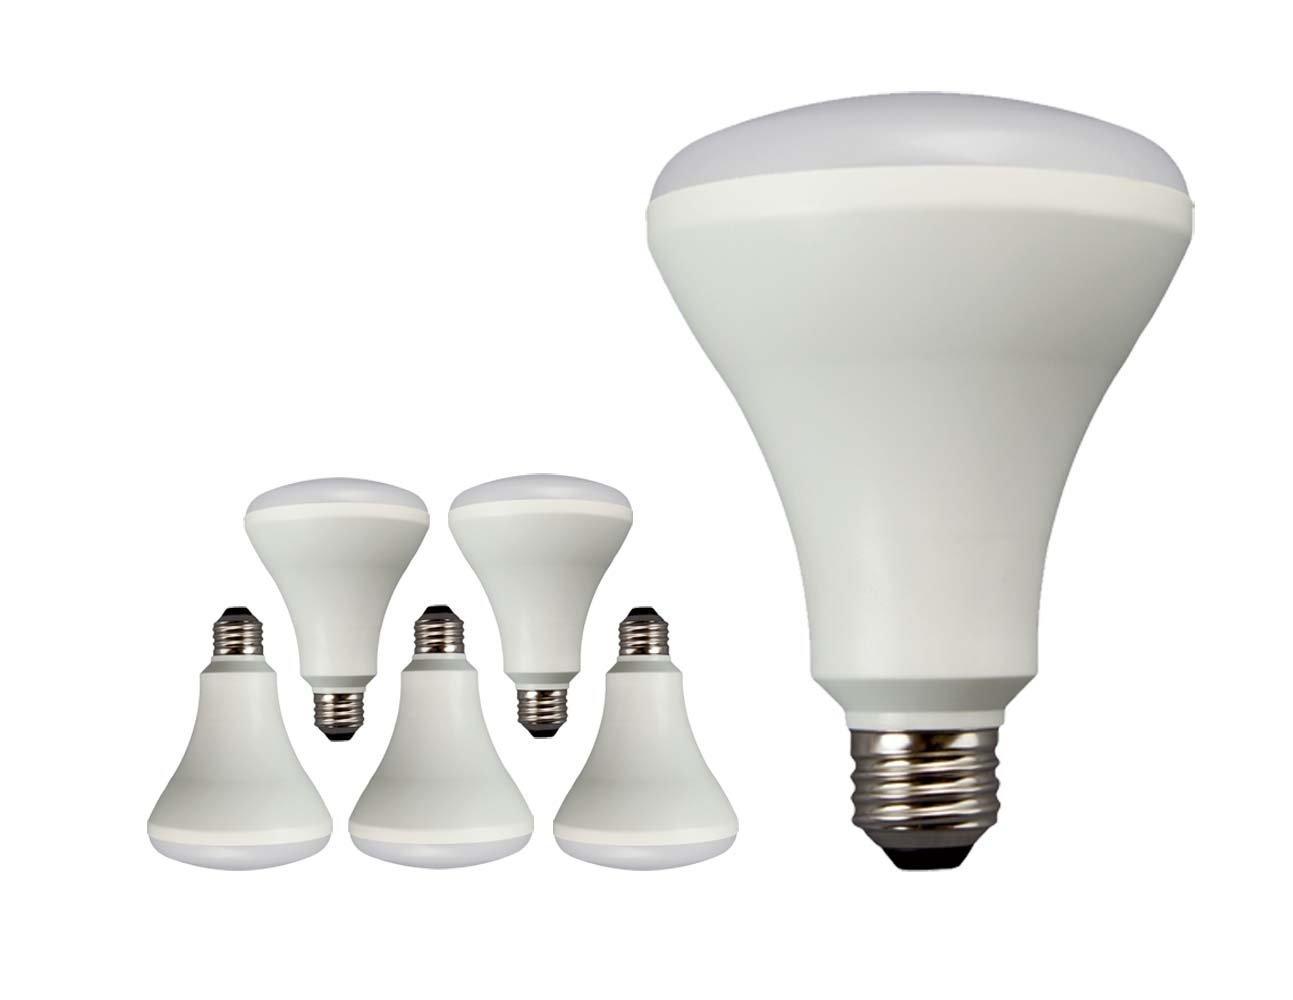 TCP 65 Watt Equivalent LED BR30 Flood Light Bulbs, ENERGY STAR Certified, Dimmable, Daylight (6 Pack)